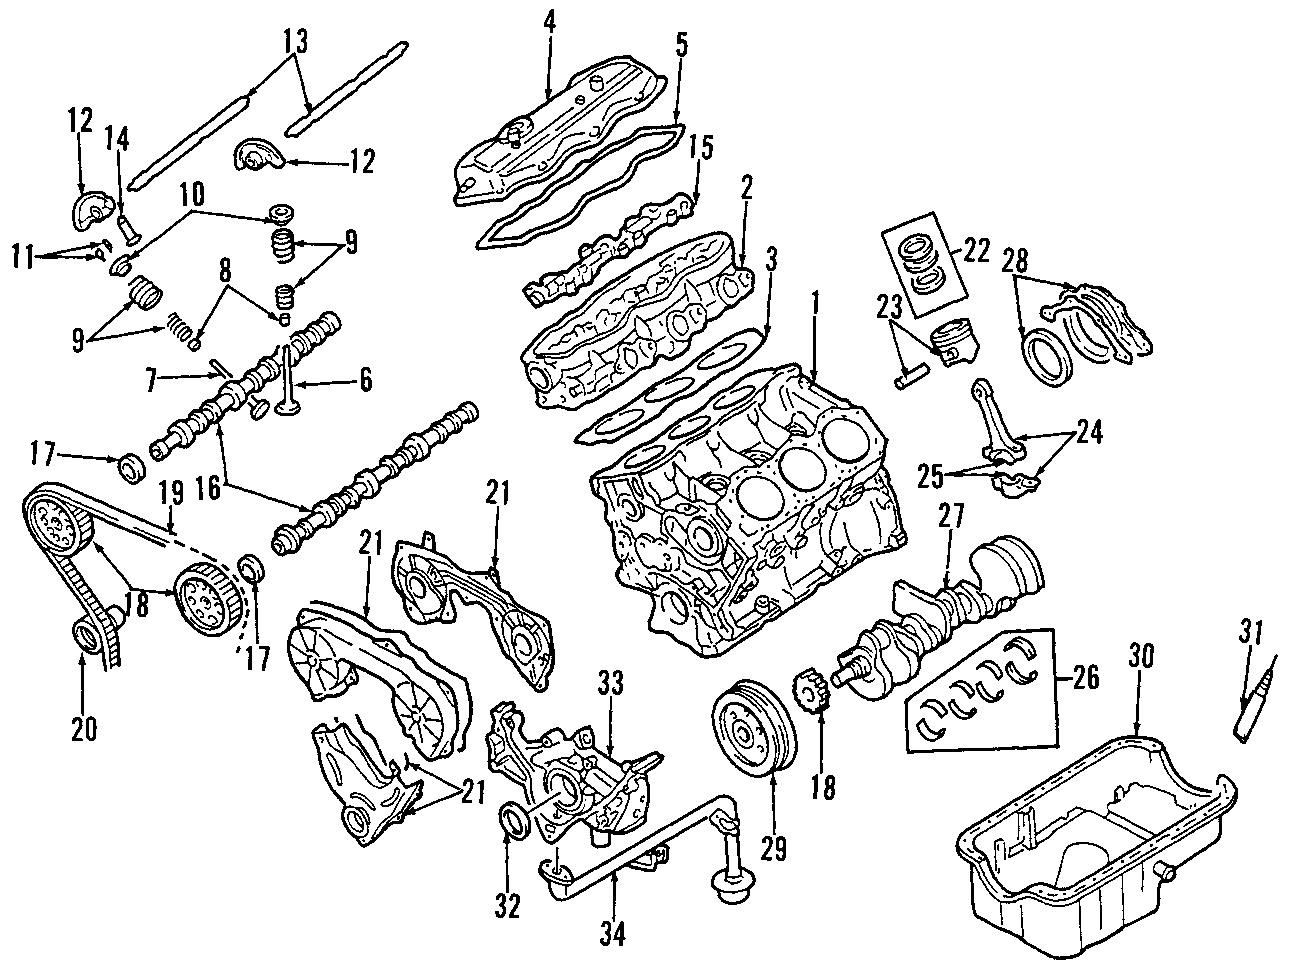 Nissan 720 Seal Crankshaft Oil Cranks Engine Rear